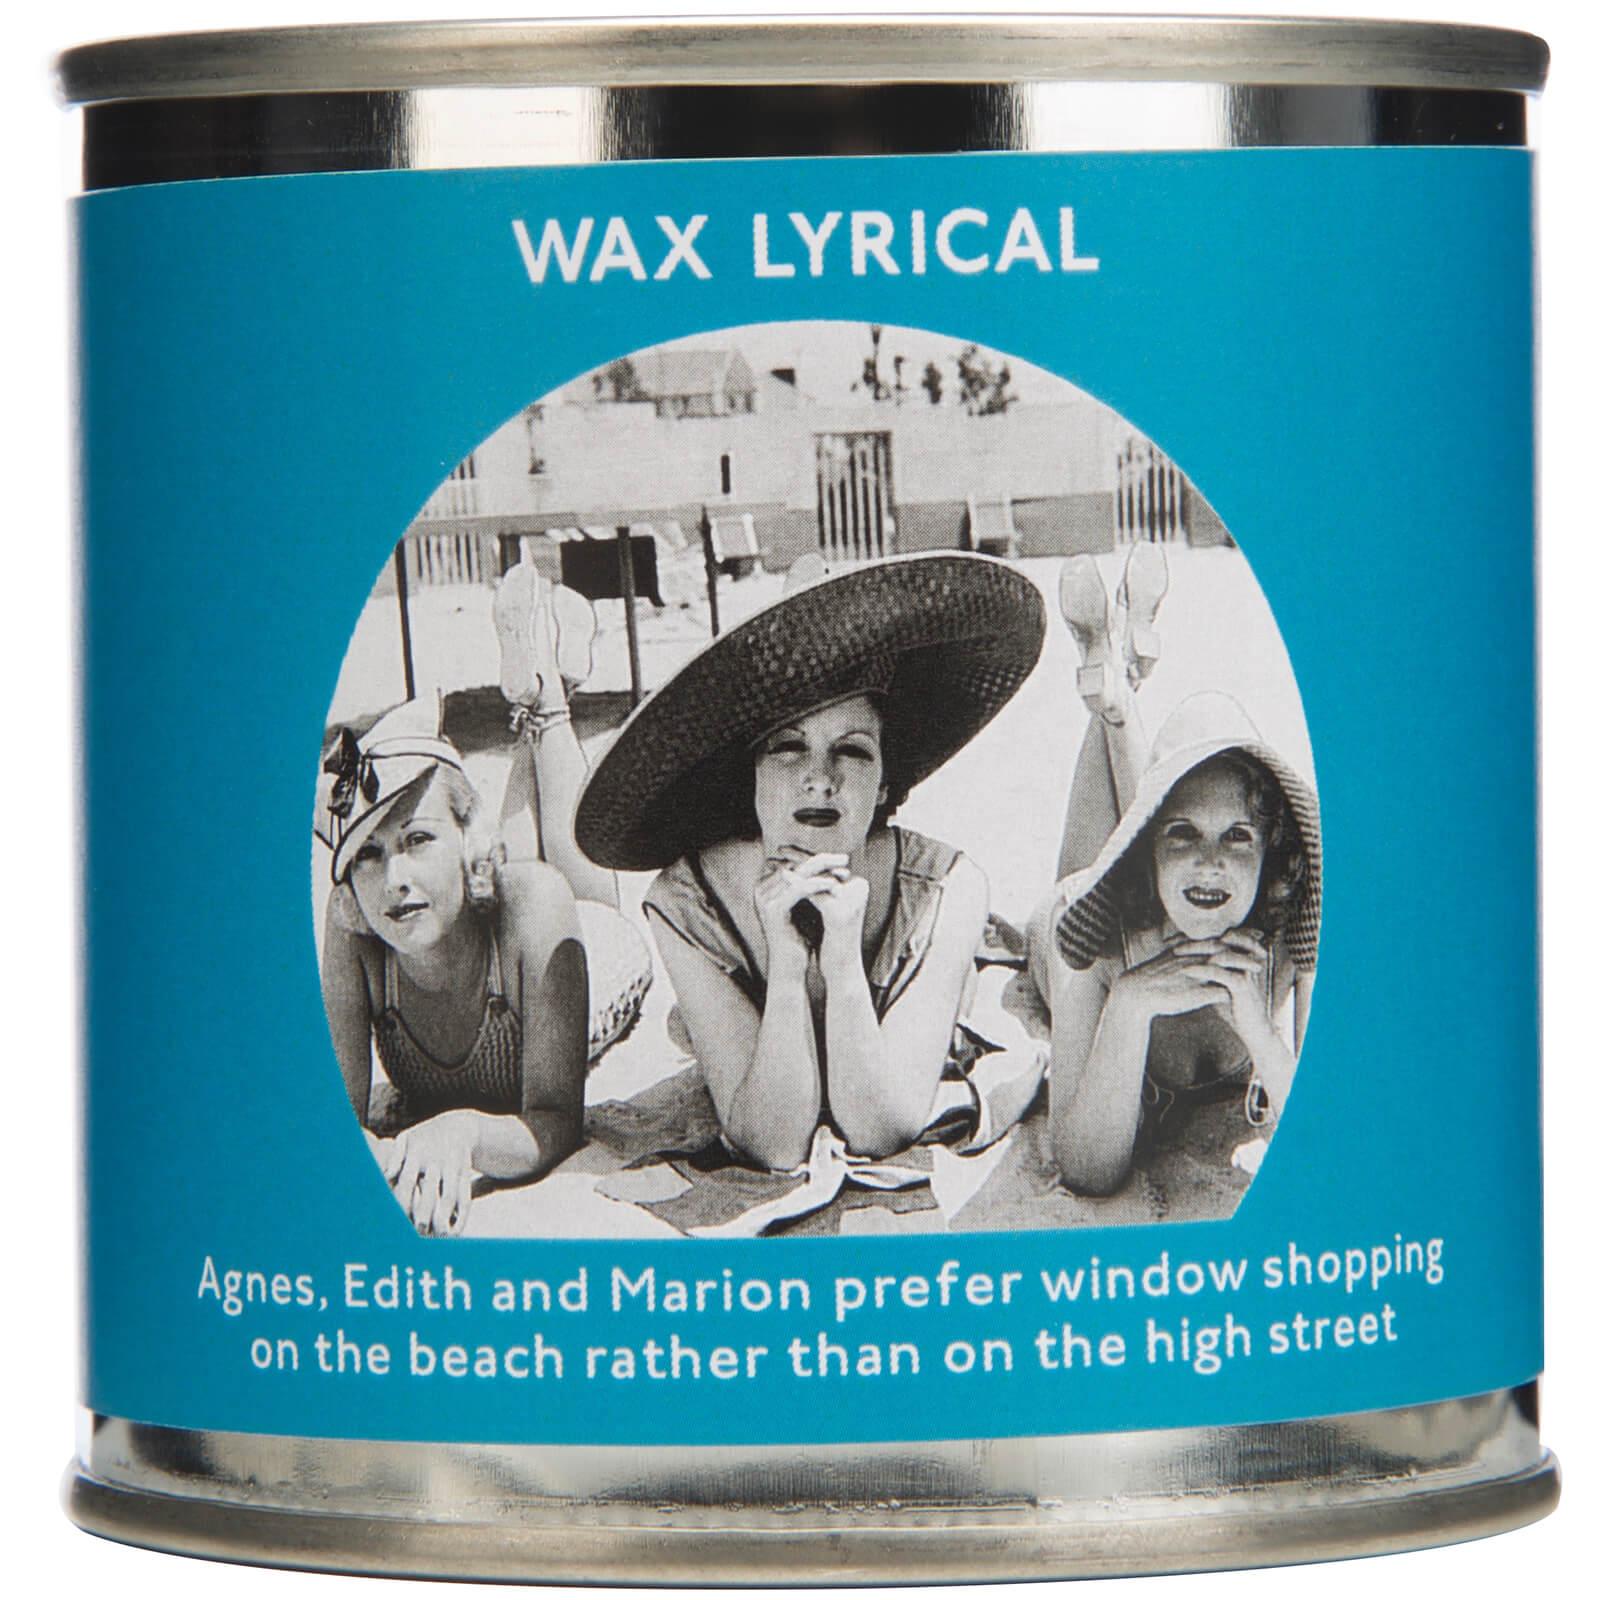 Wax Lyrical Enter-tin-ment Shopping Trip Wax Filled Candle